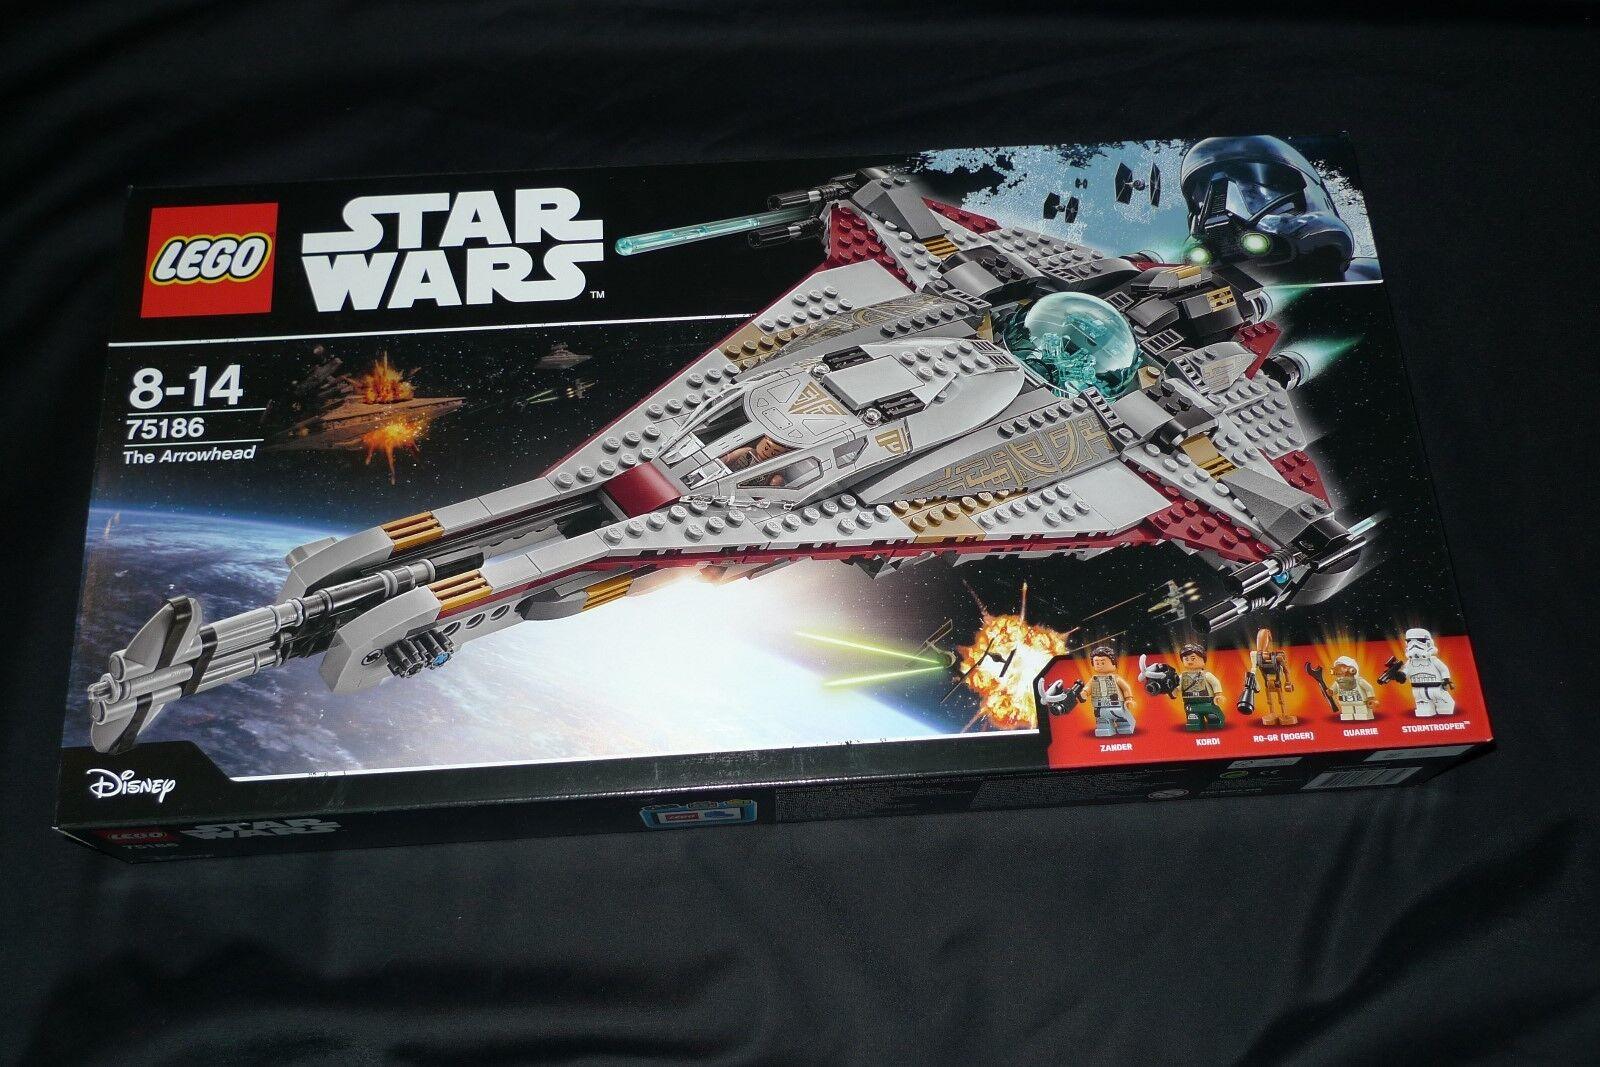 Lego 75186 - Star Wars - Arrowhead - NUOVO SIGILLATO